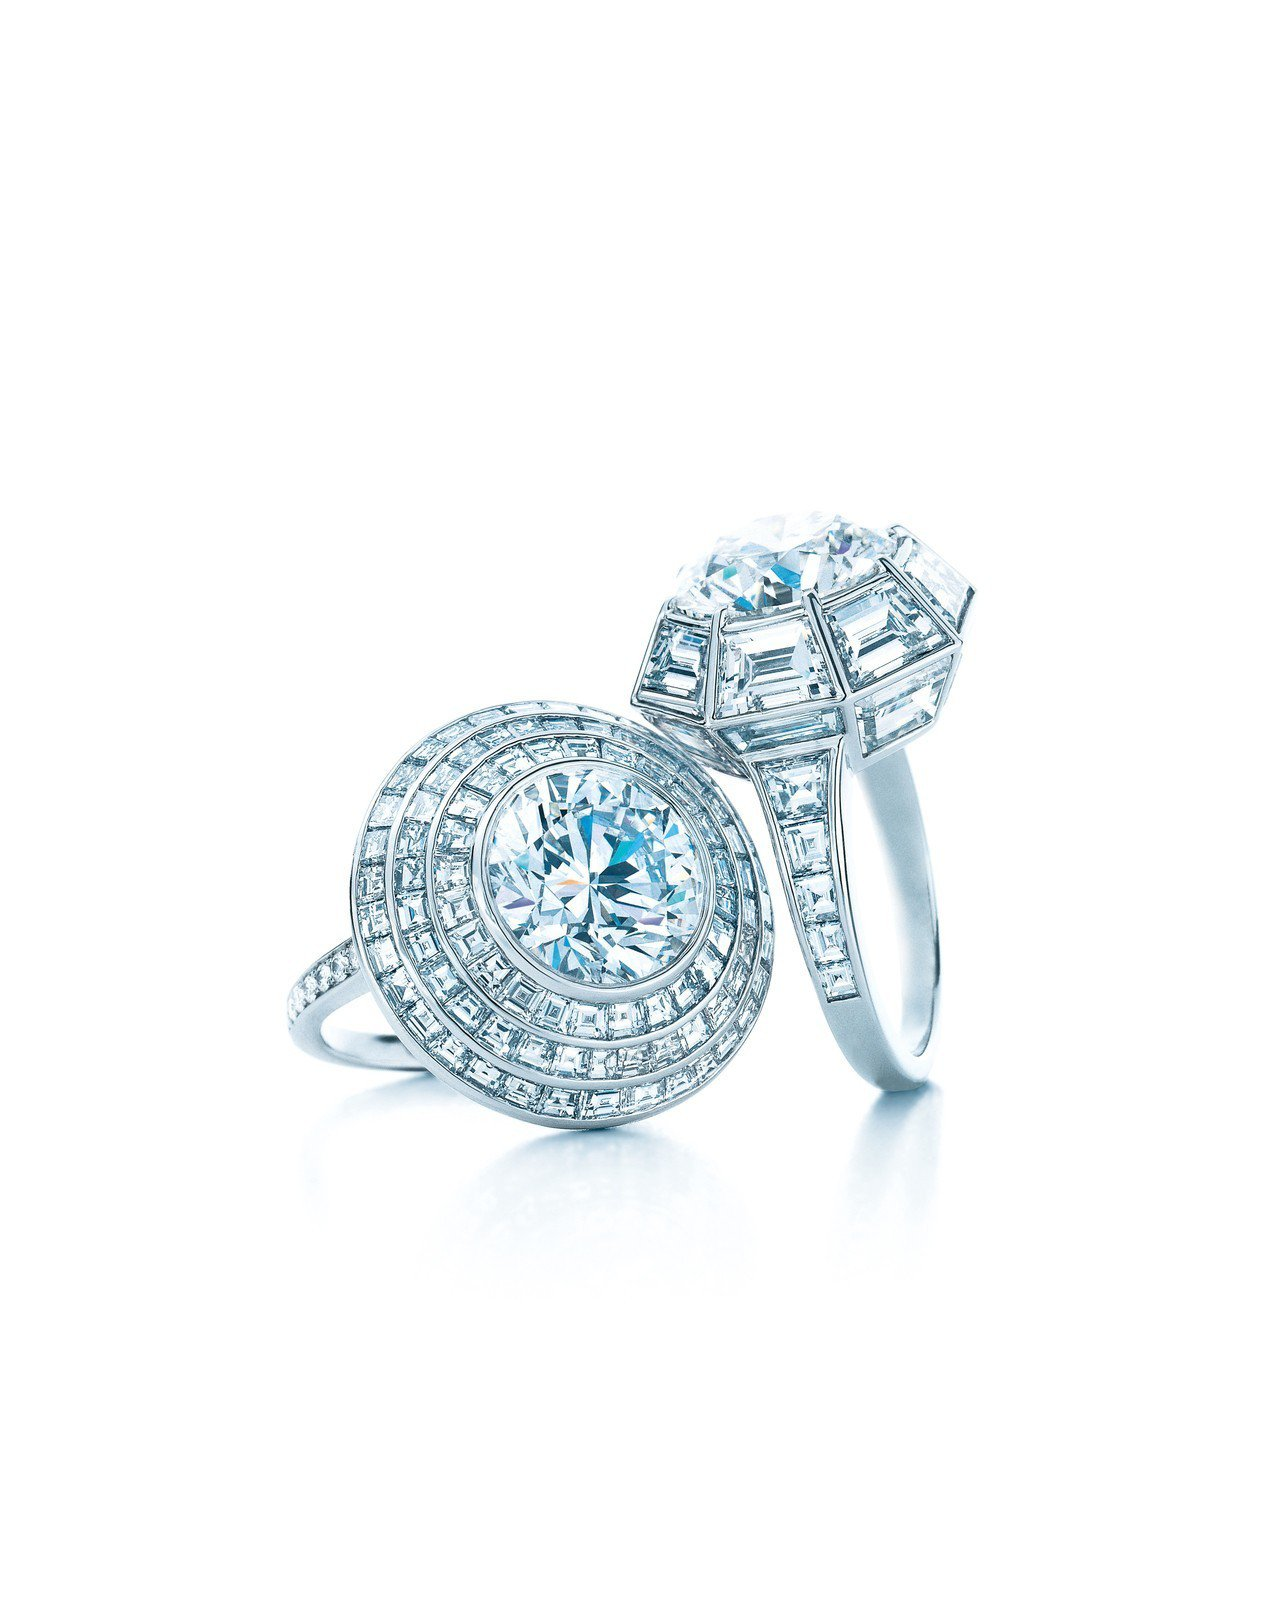 Tiffany鉑金鑲嵌5.01克拉圓形切割鑽石戒指(E,VS1) 2,209萬元...